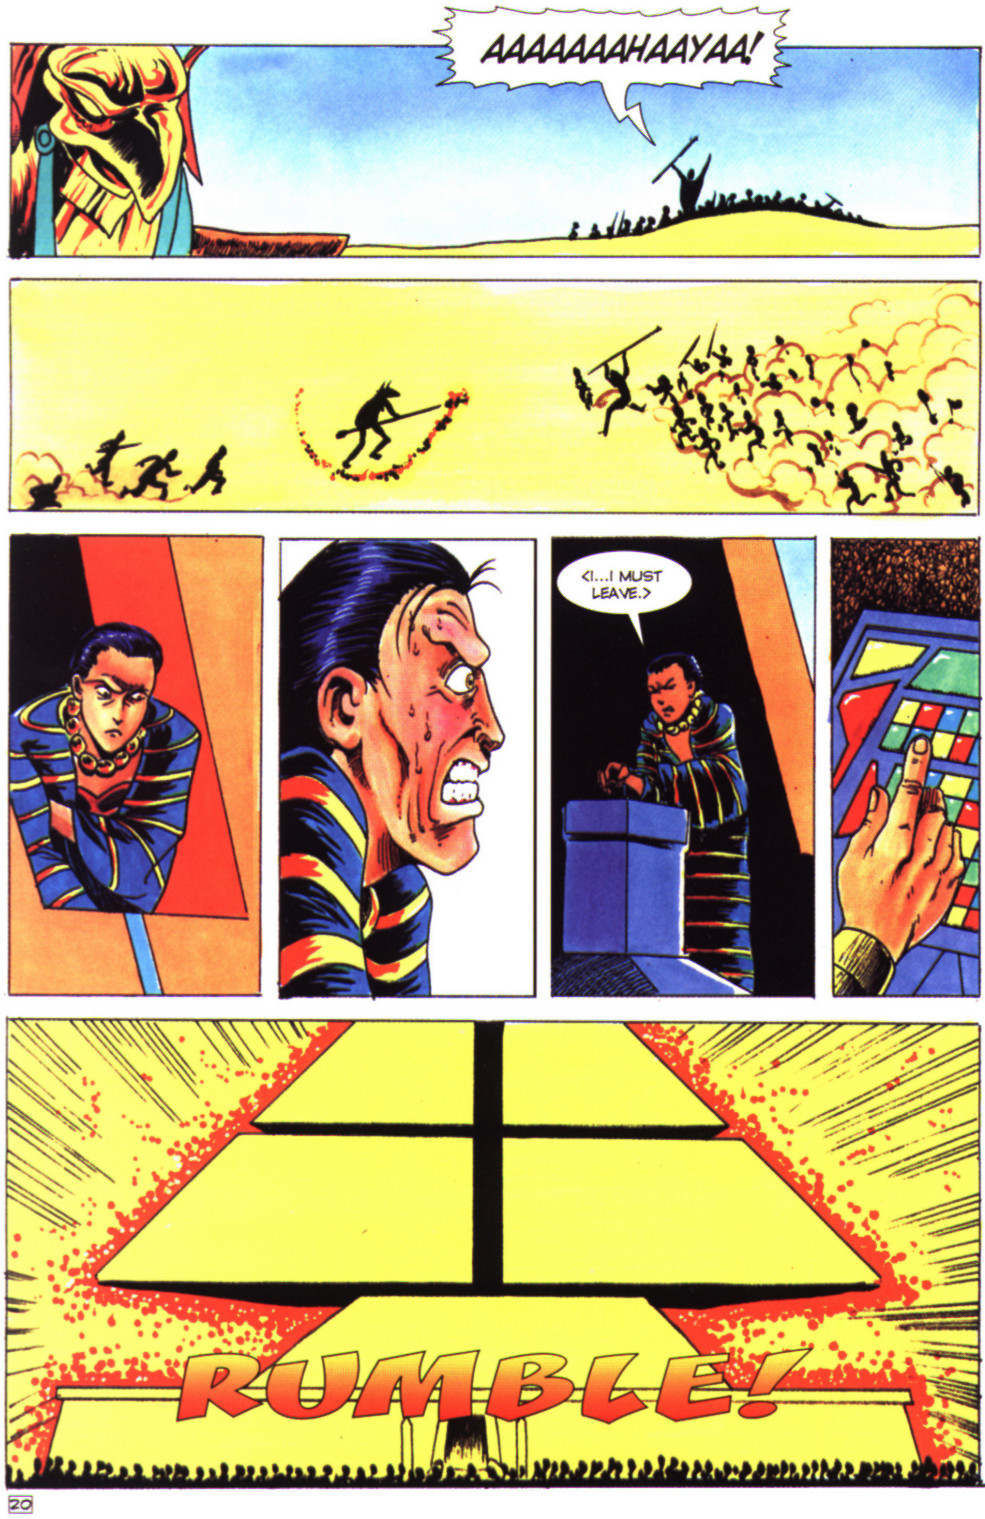 Read online Stargate comic -  Issue #4 - 22